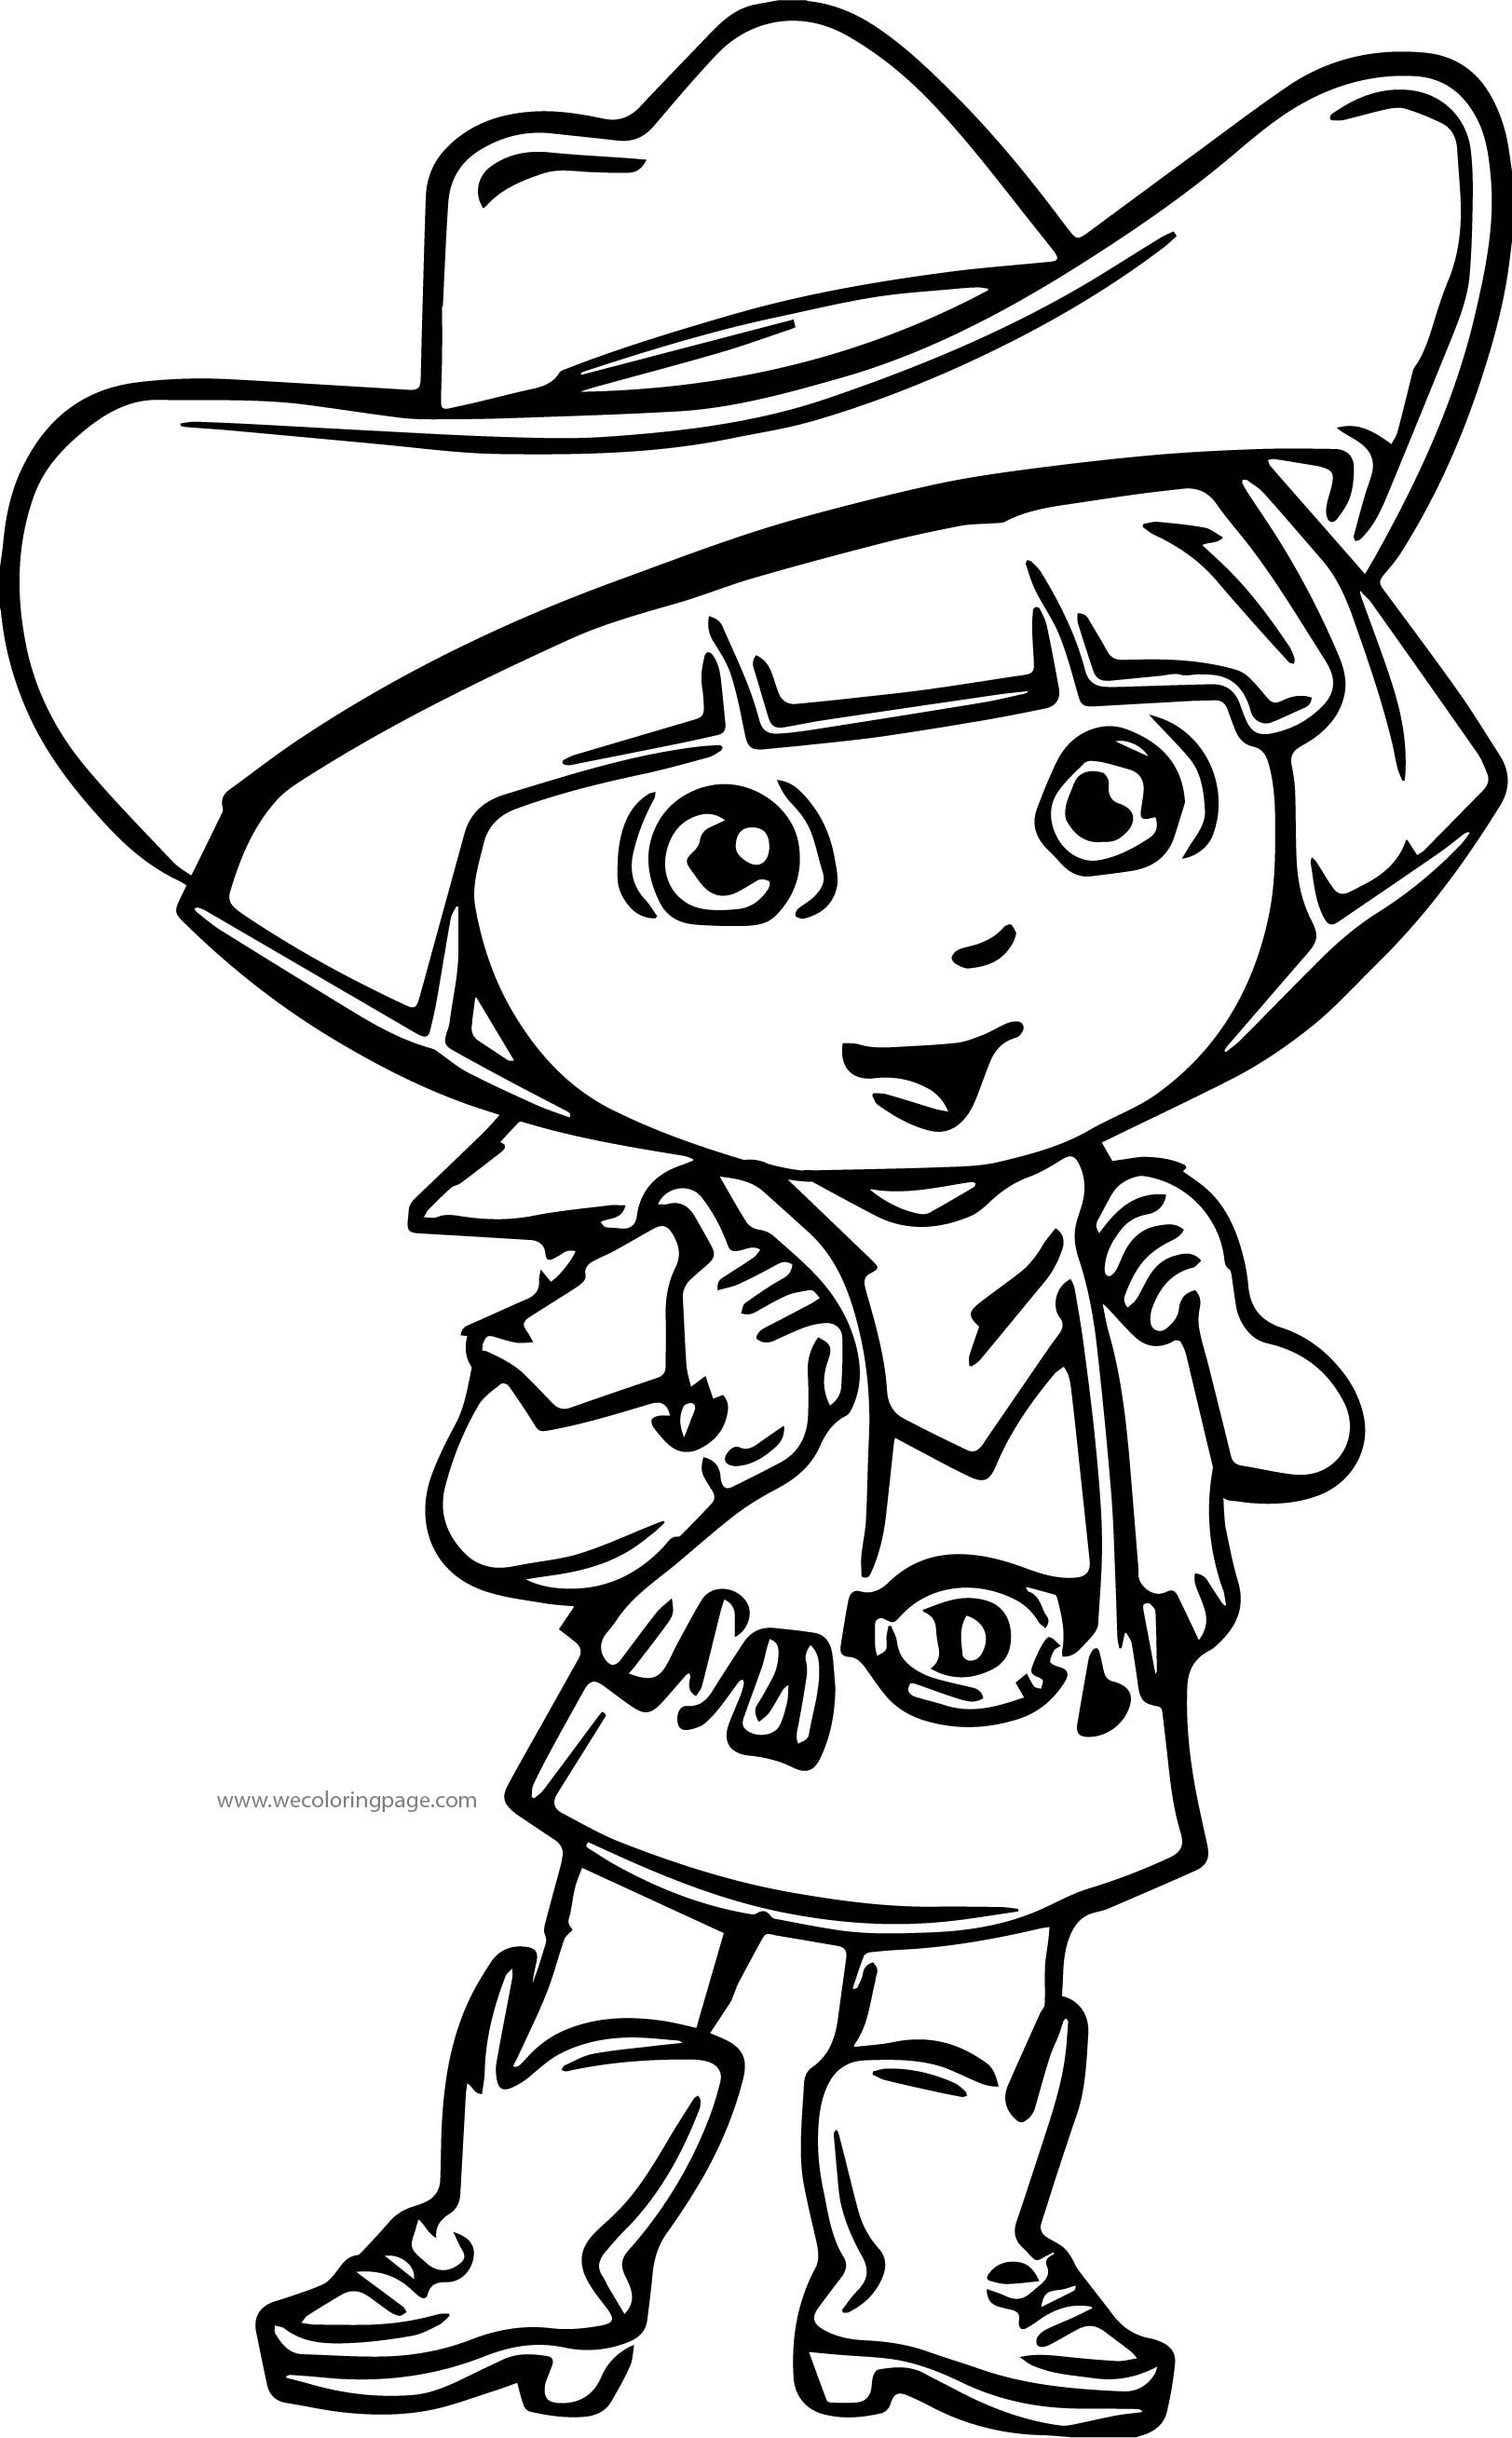 Dora The Explorer Cowboy Coloring Page , Dora The Explorer Cowboy ...